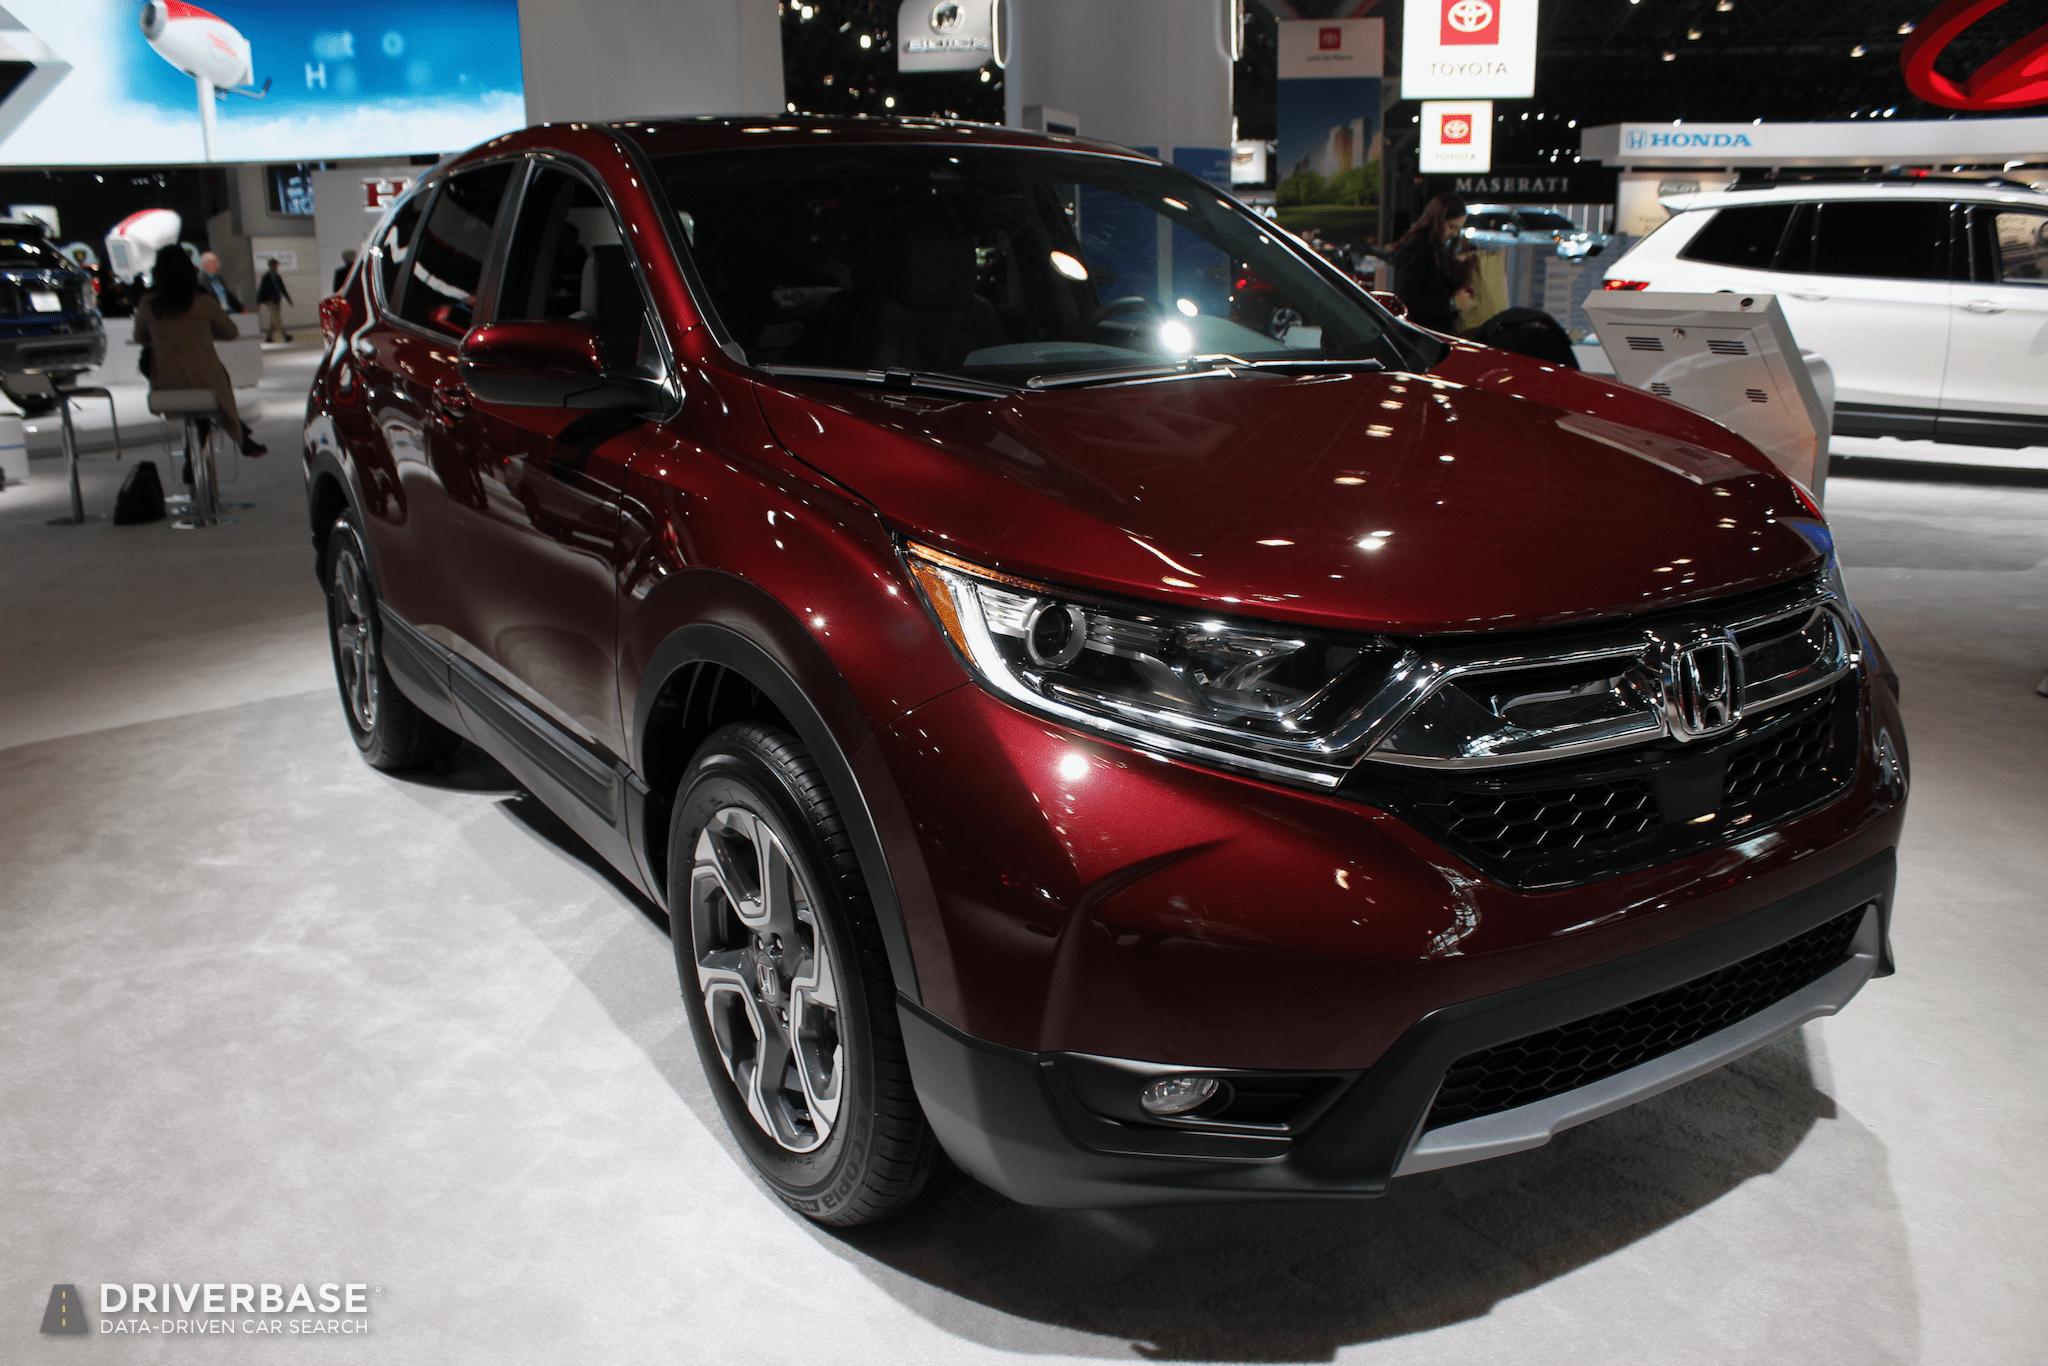 2020 Honda Crv Suv At The 2019 New York Auto Show Driverbase